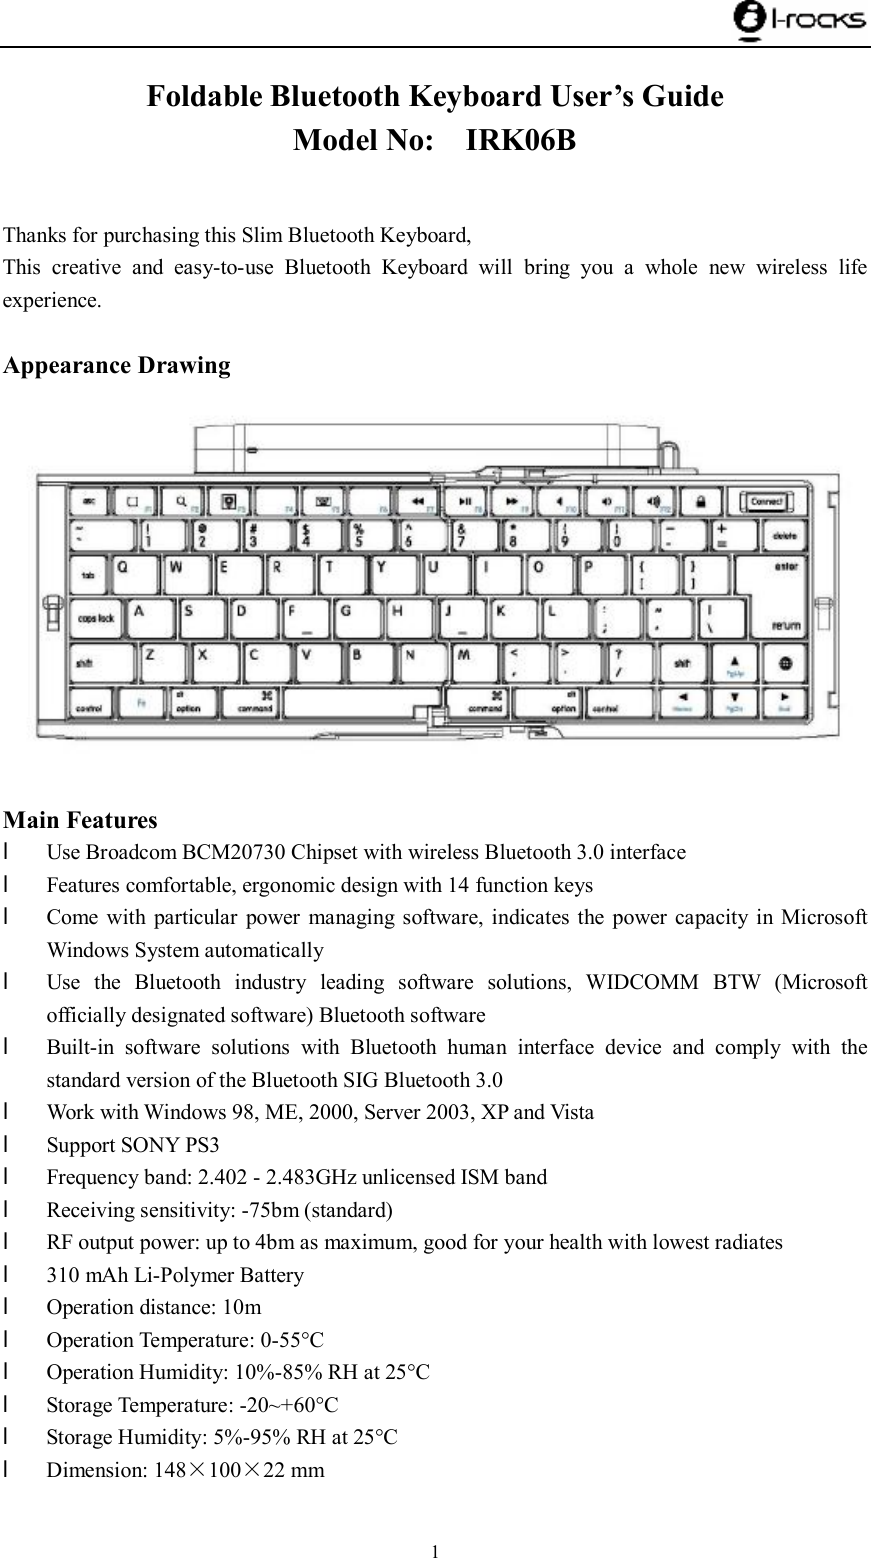 blackweb wireless keyboard instructions